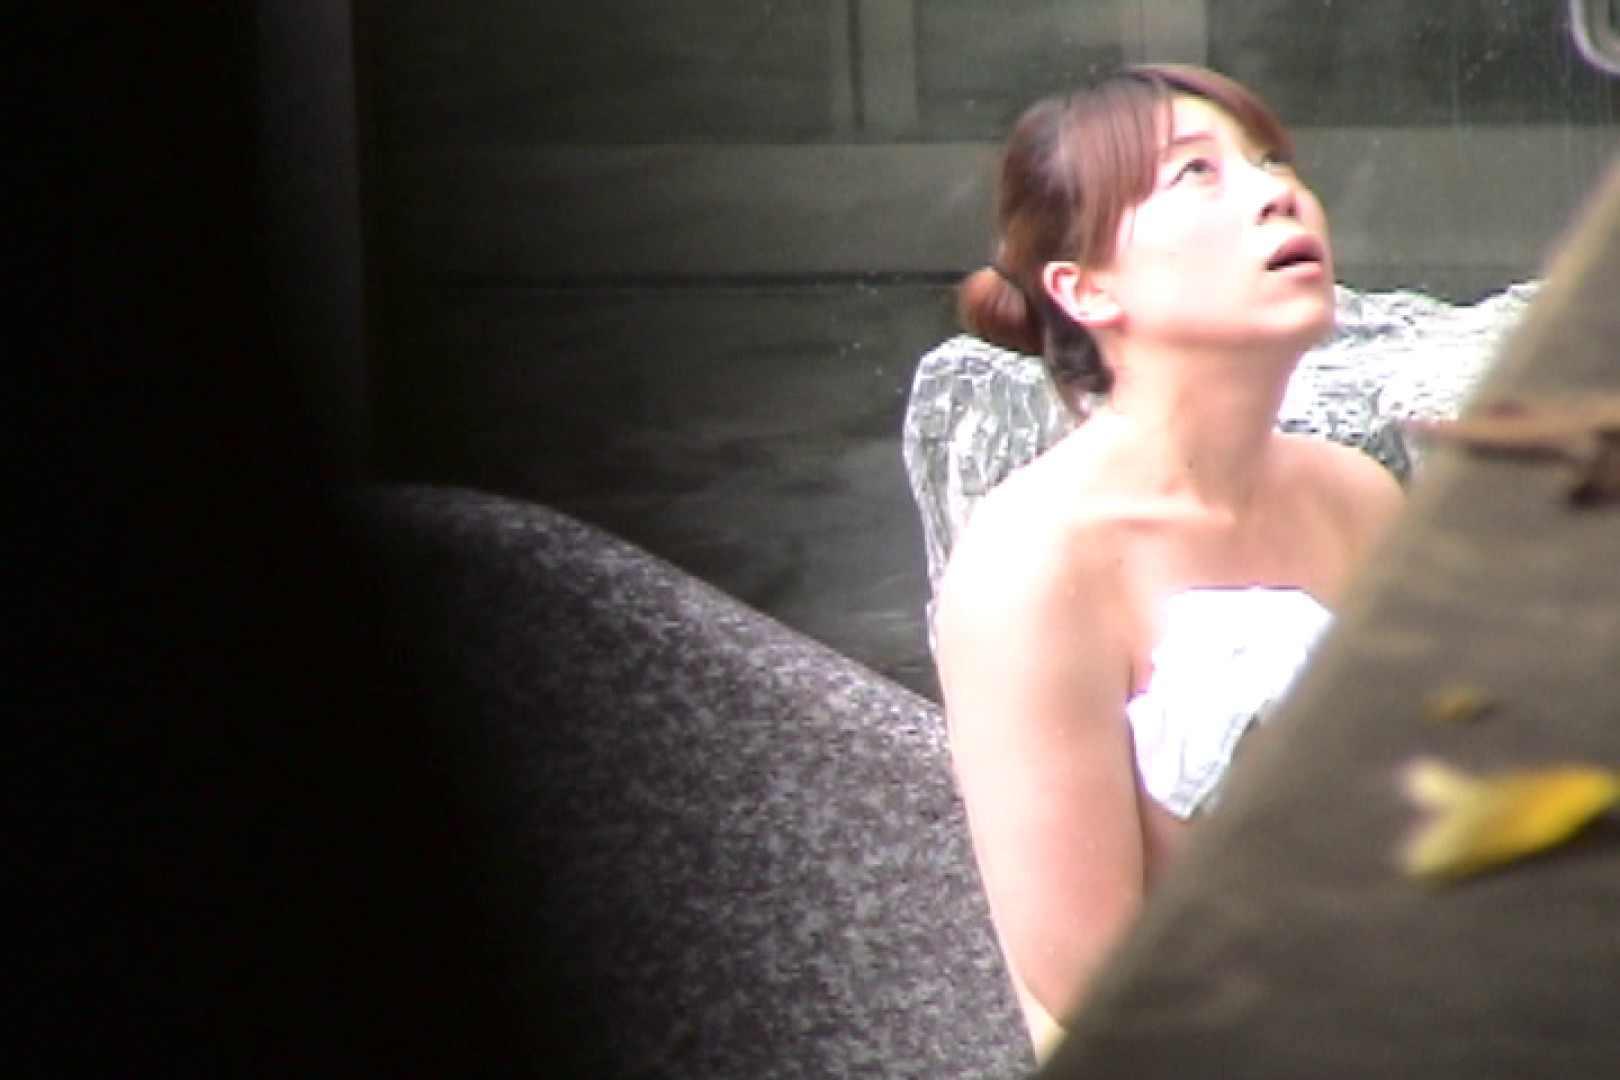 Aquaな露天風呂Vol.704 露天風呂編 | 盗撮シリーズ  93PIX 3